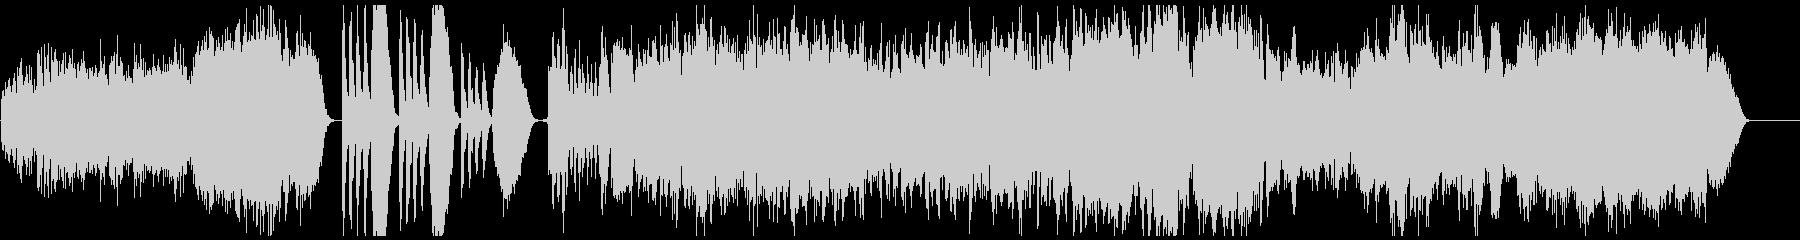 RV565_1『アレグロ』ヴィヴァルディの未再生の波形